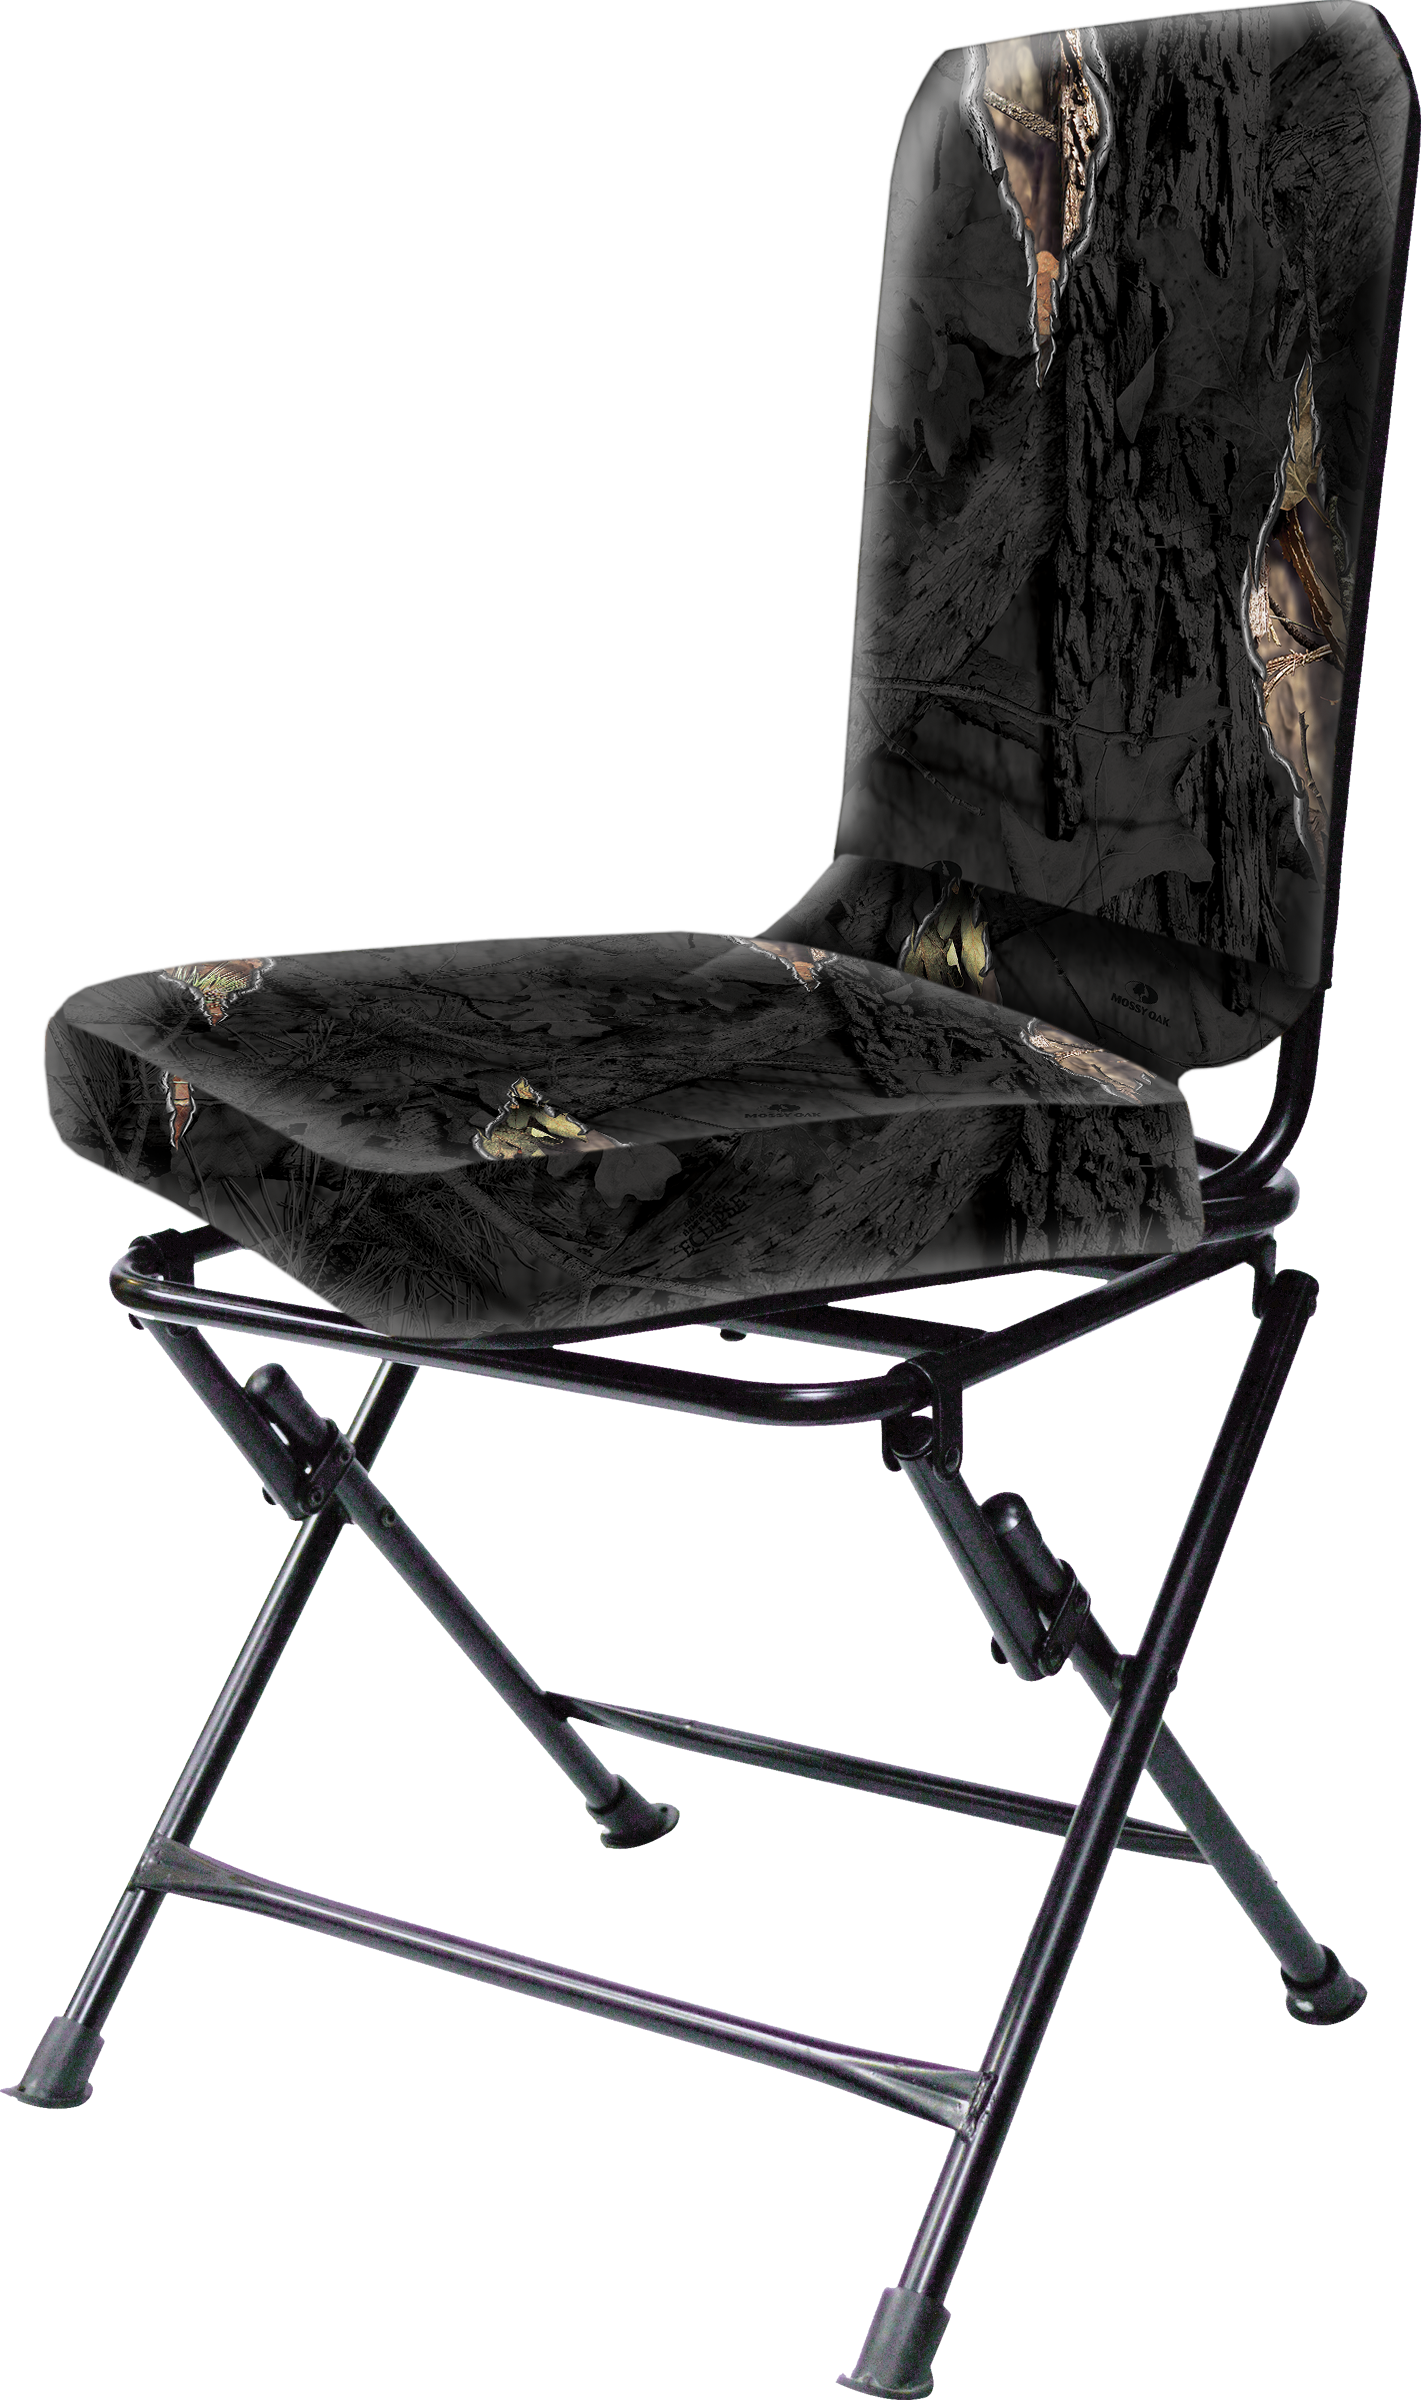 Mossy Oak Swivel Blind Chair Eclipse Camo Walmart Com Walmart Com